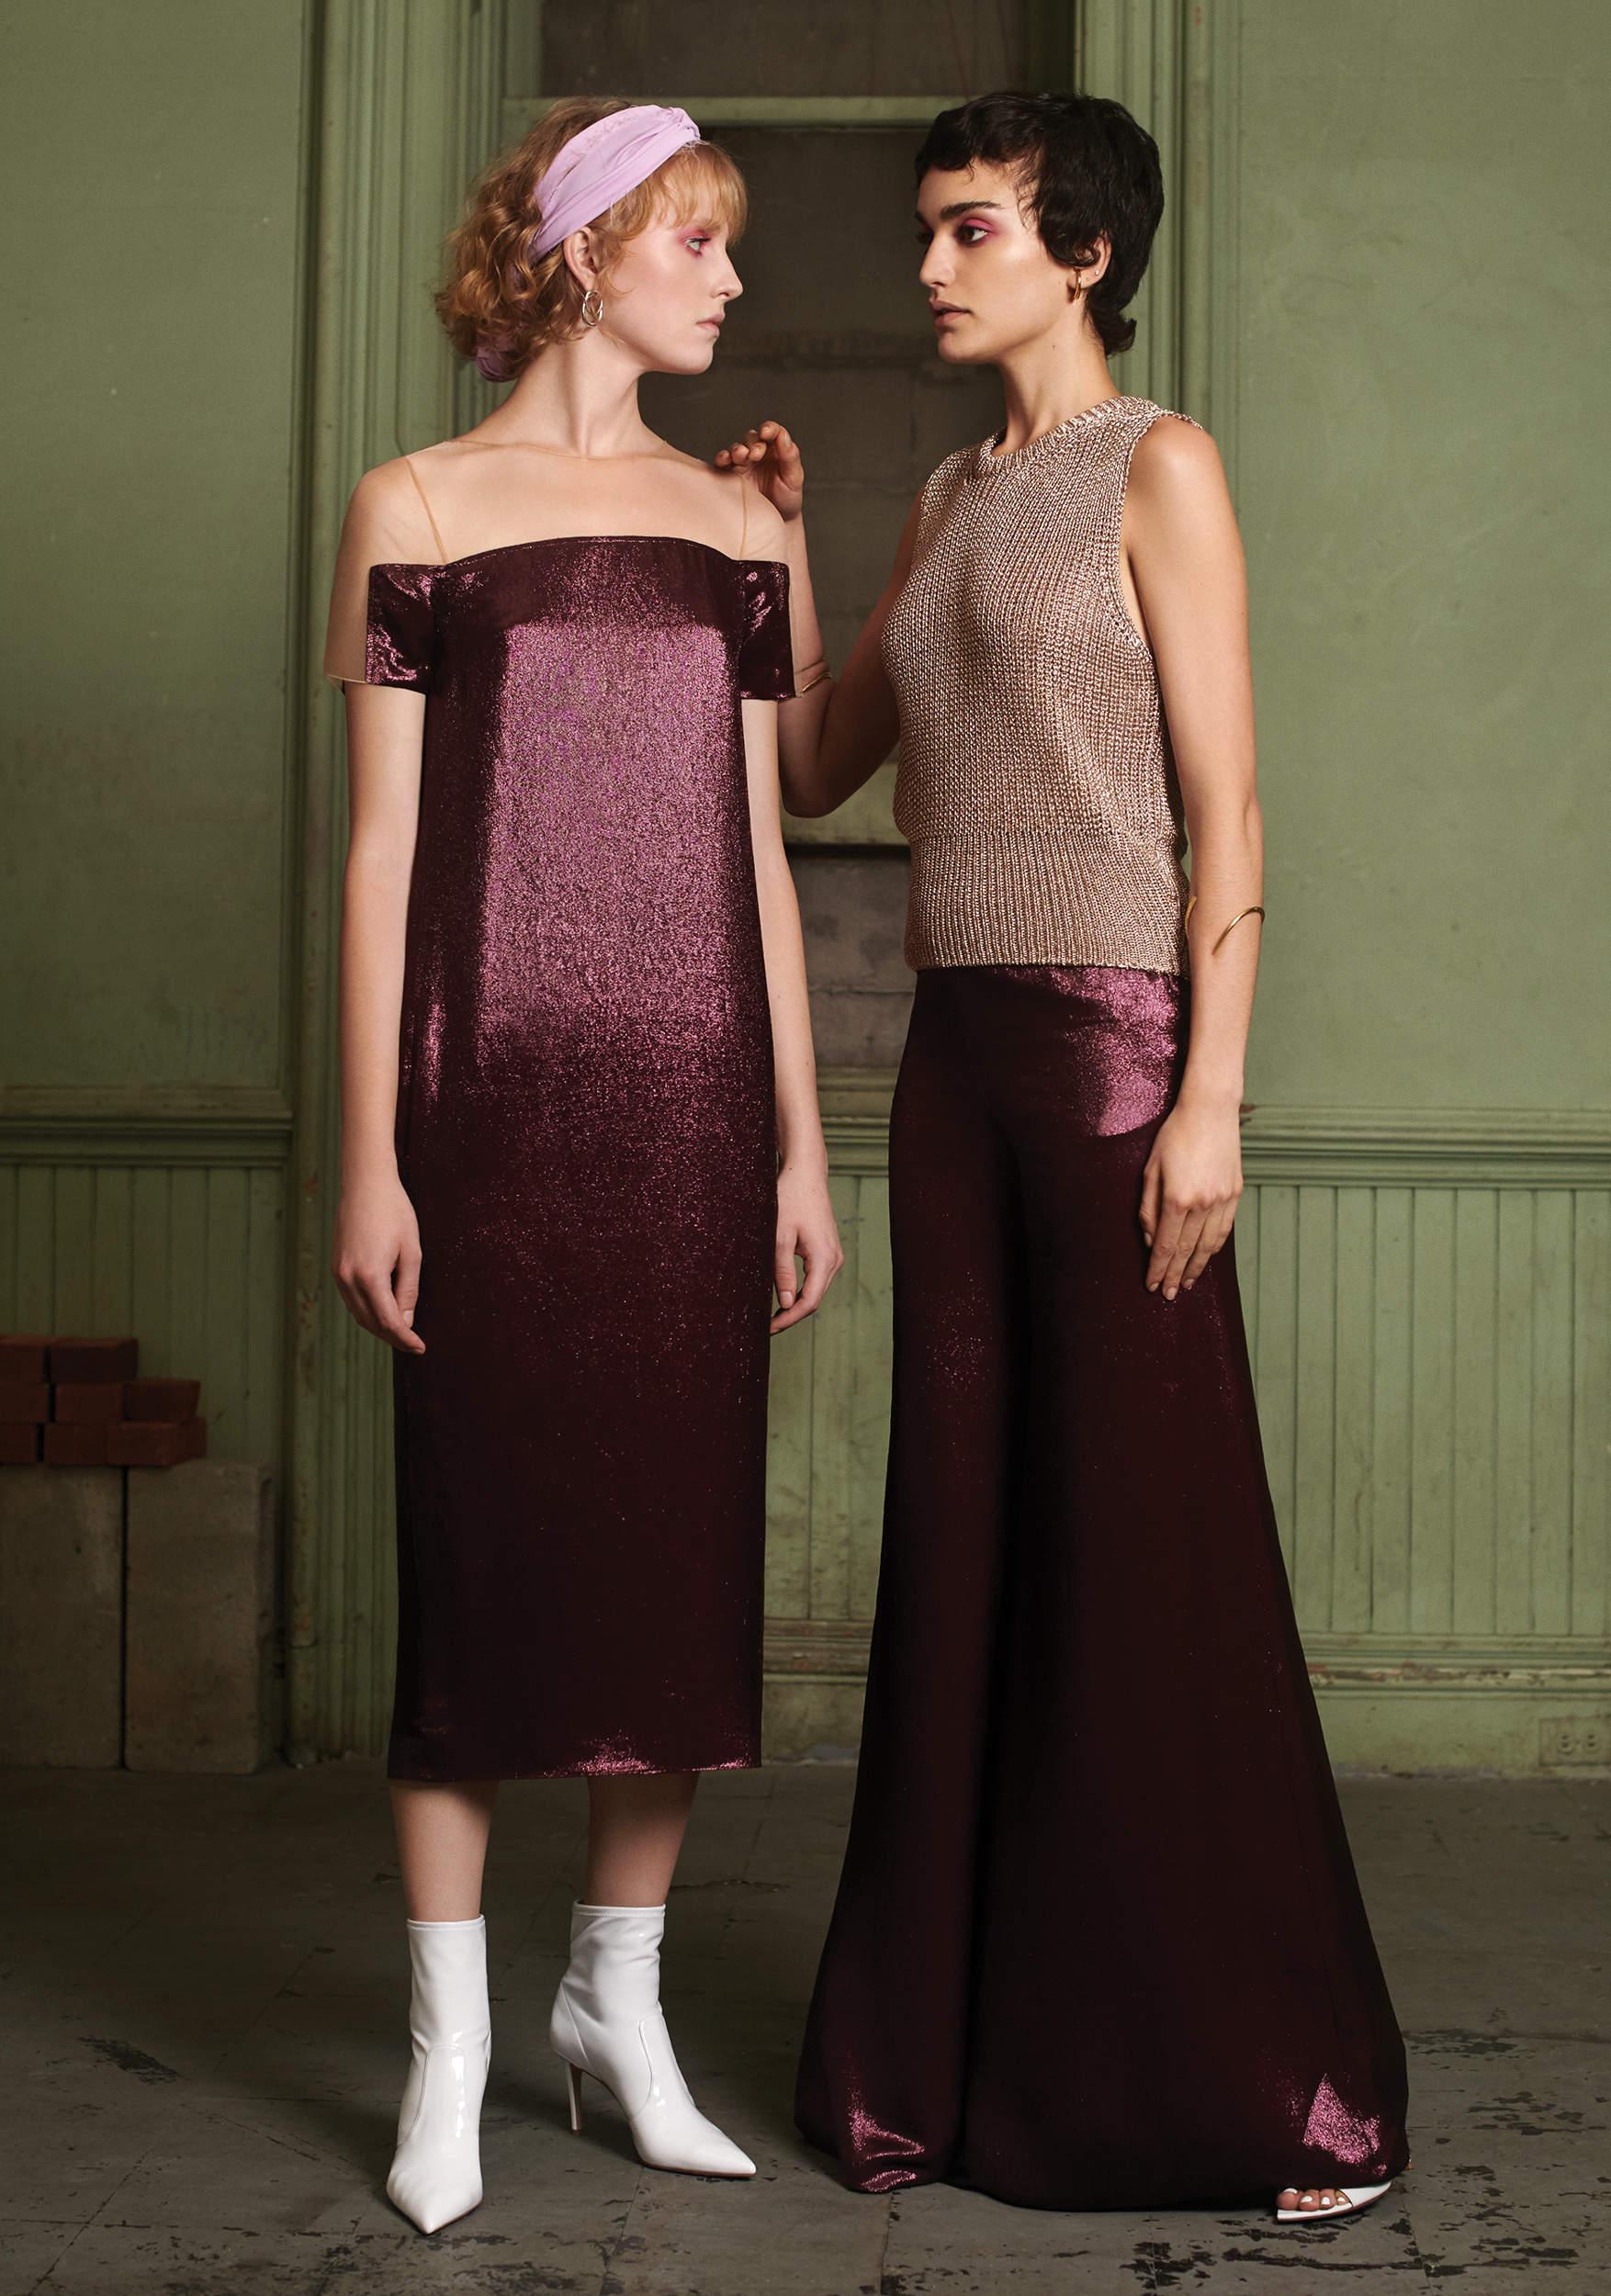 JULIANNA-BASS-SS19-23-24-Jenny-Dress Nina Sweater Jacqui Trouser.jpg